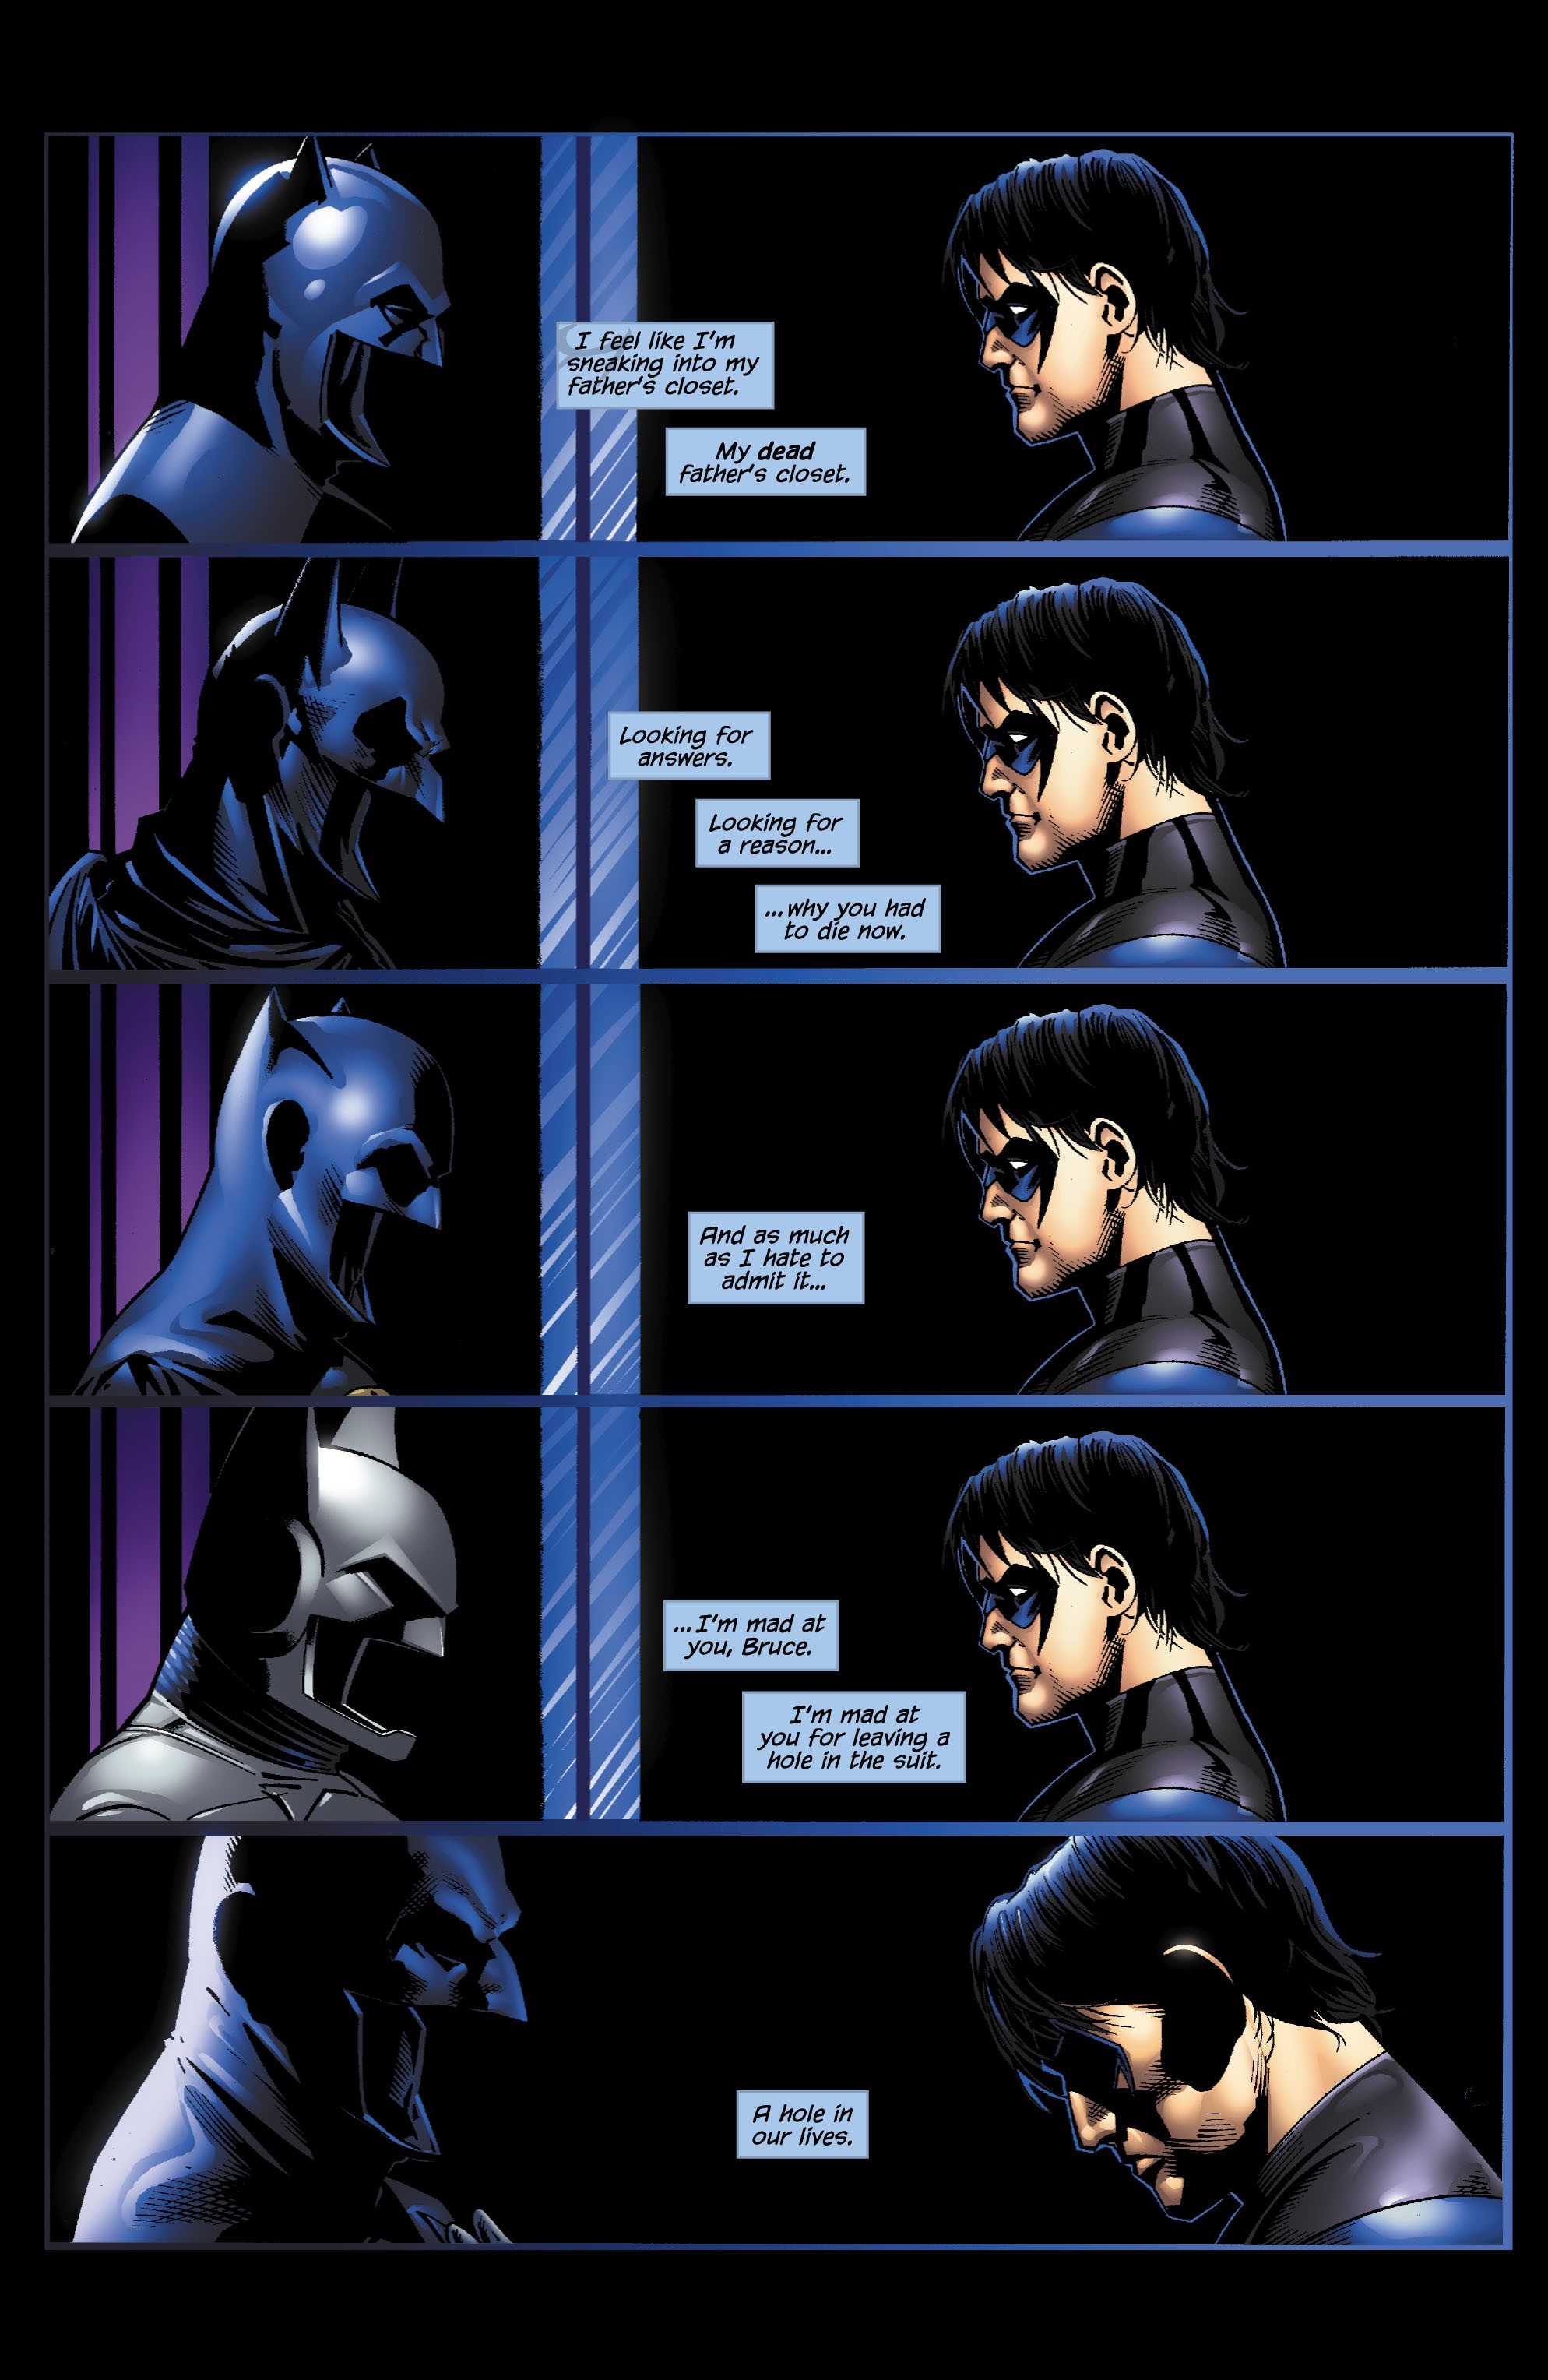 Nightwing (1996) chap 152 pic 4